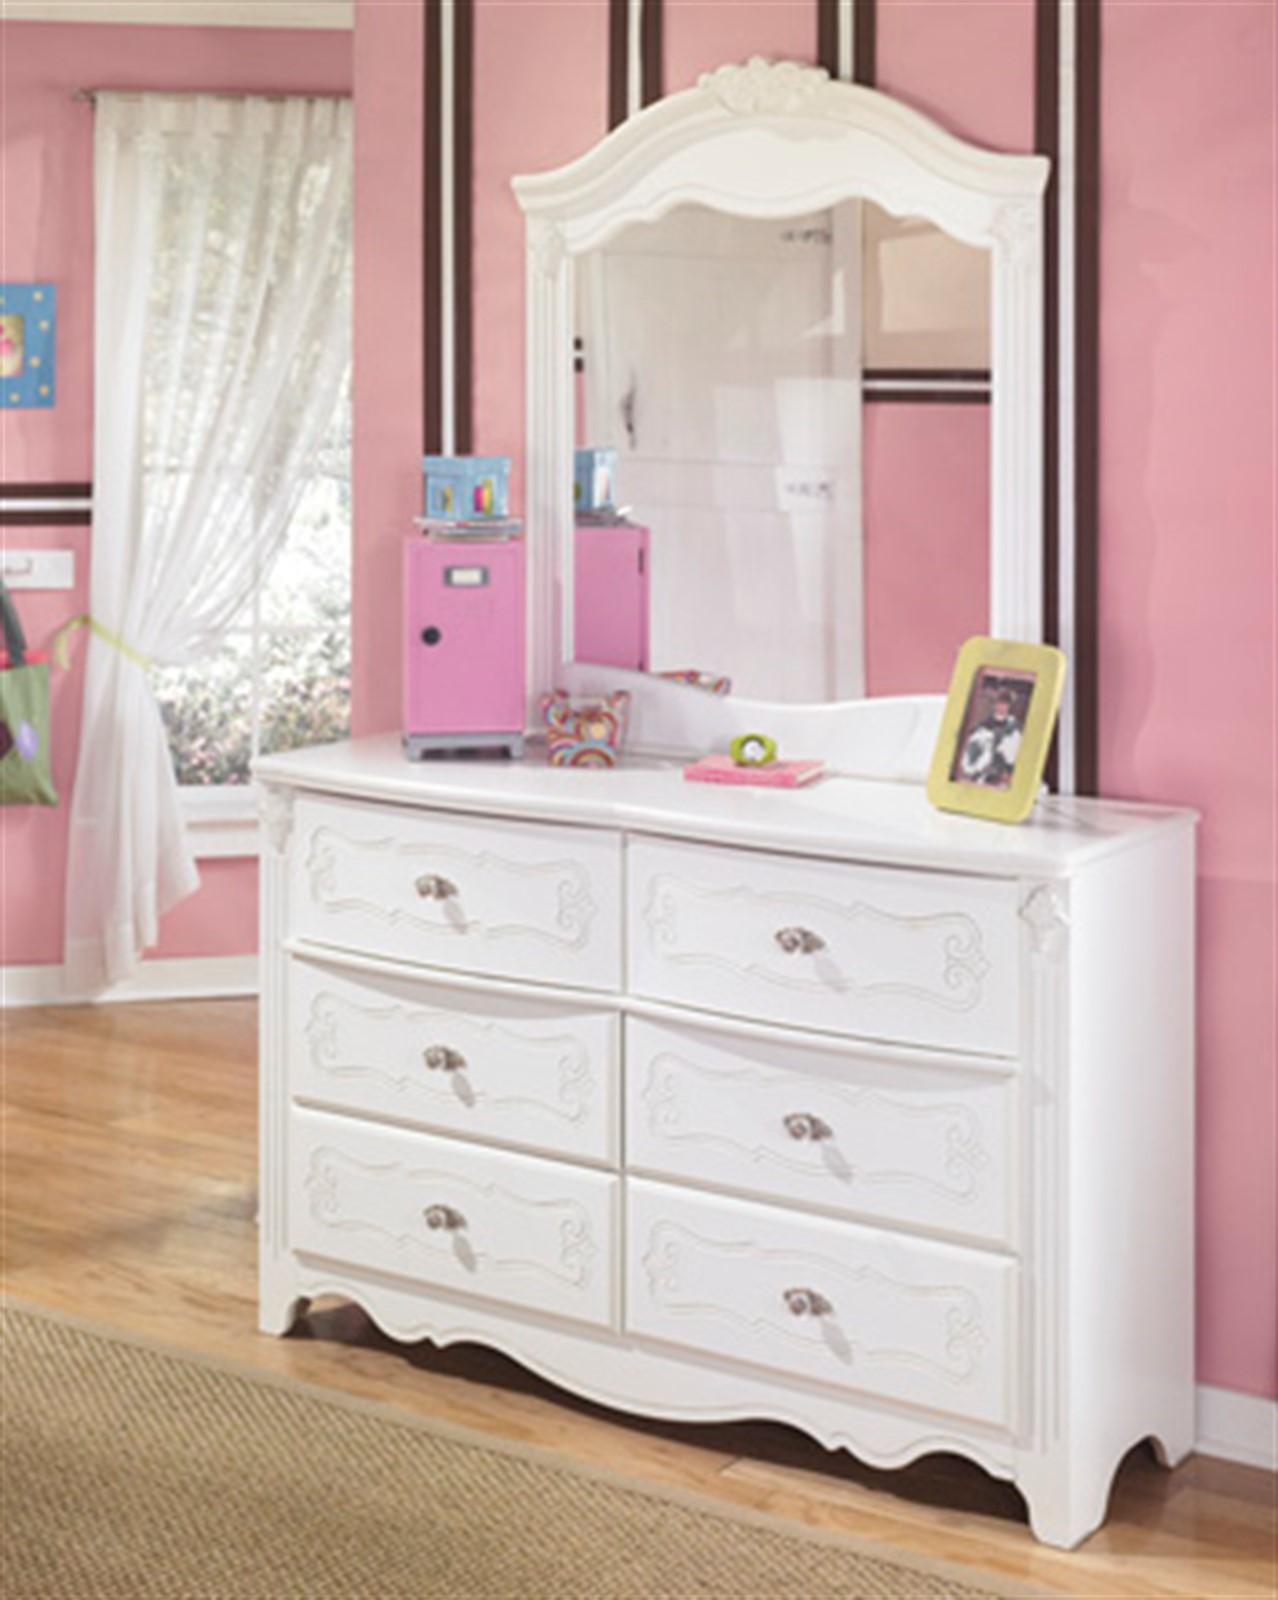 Exquisite Dresser and Mirror Set - White